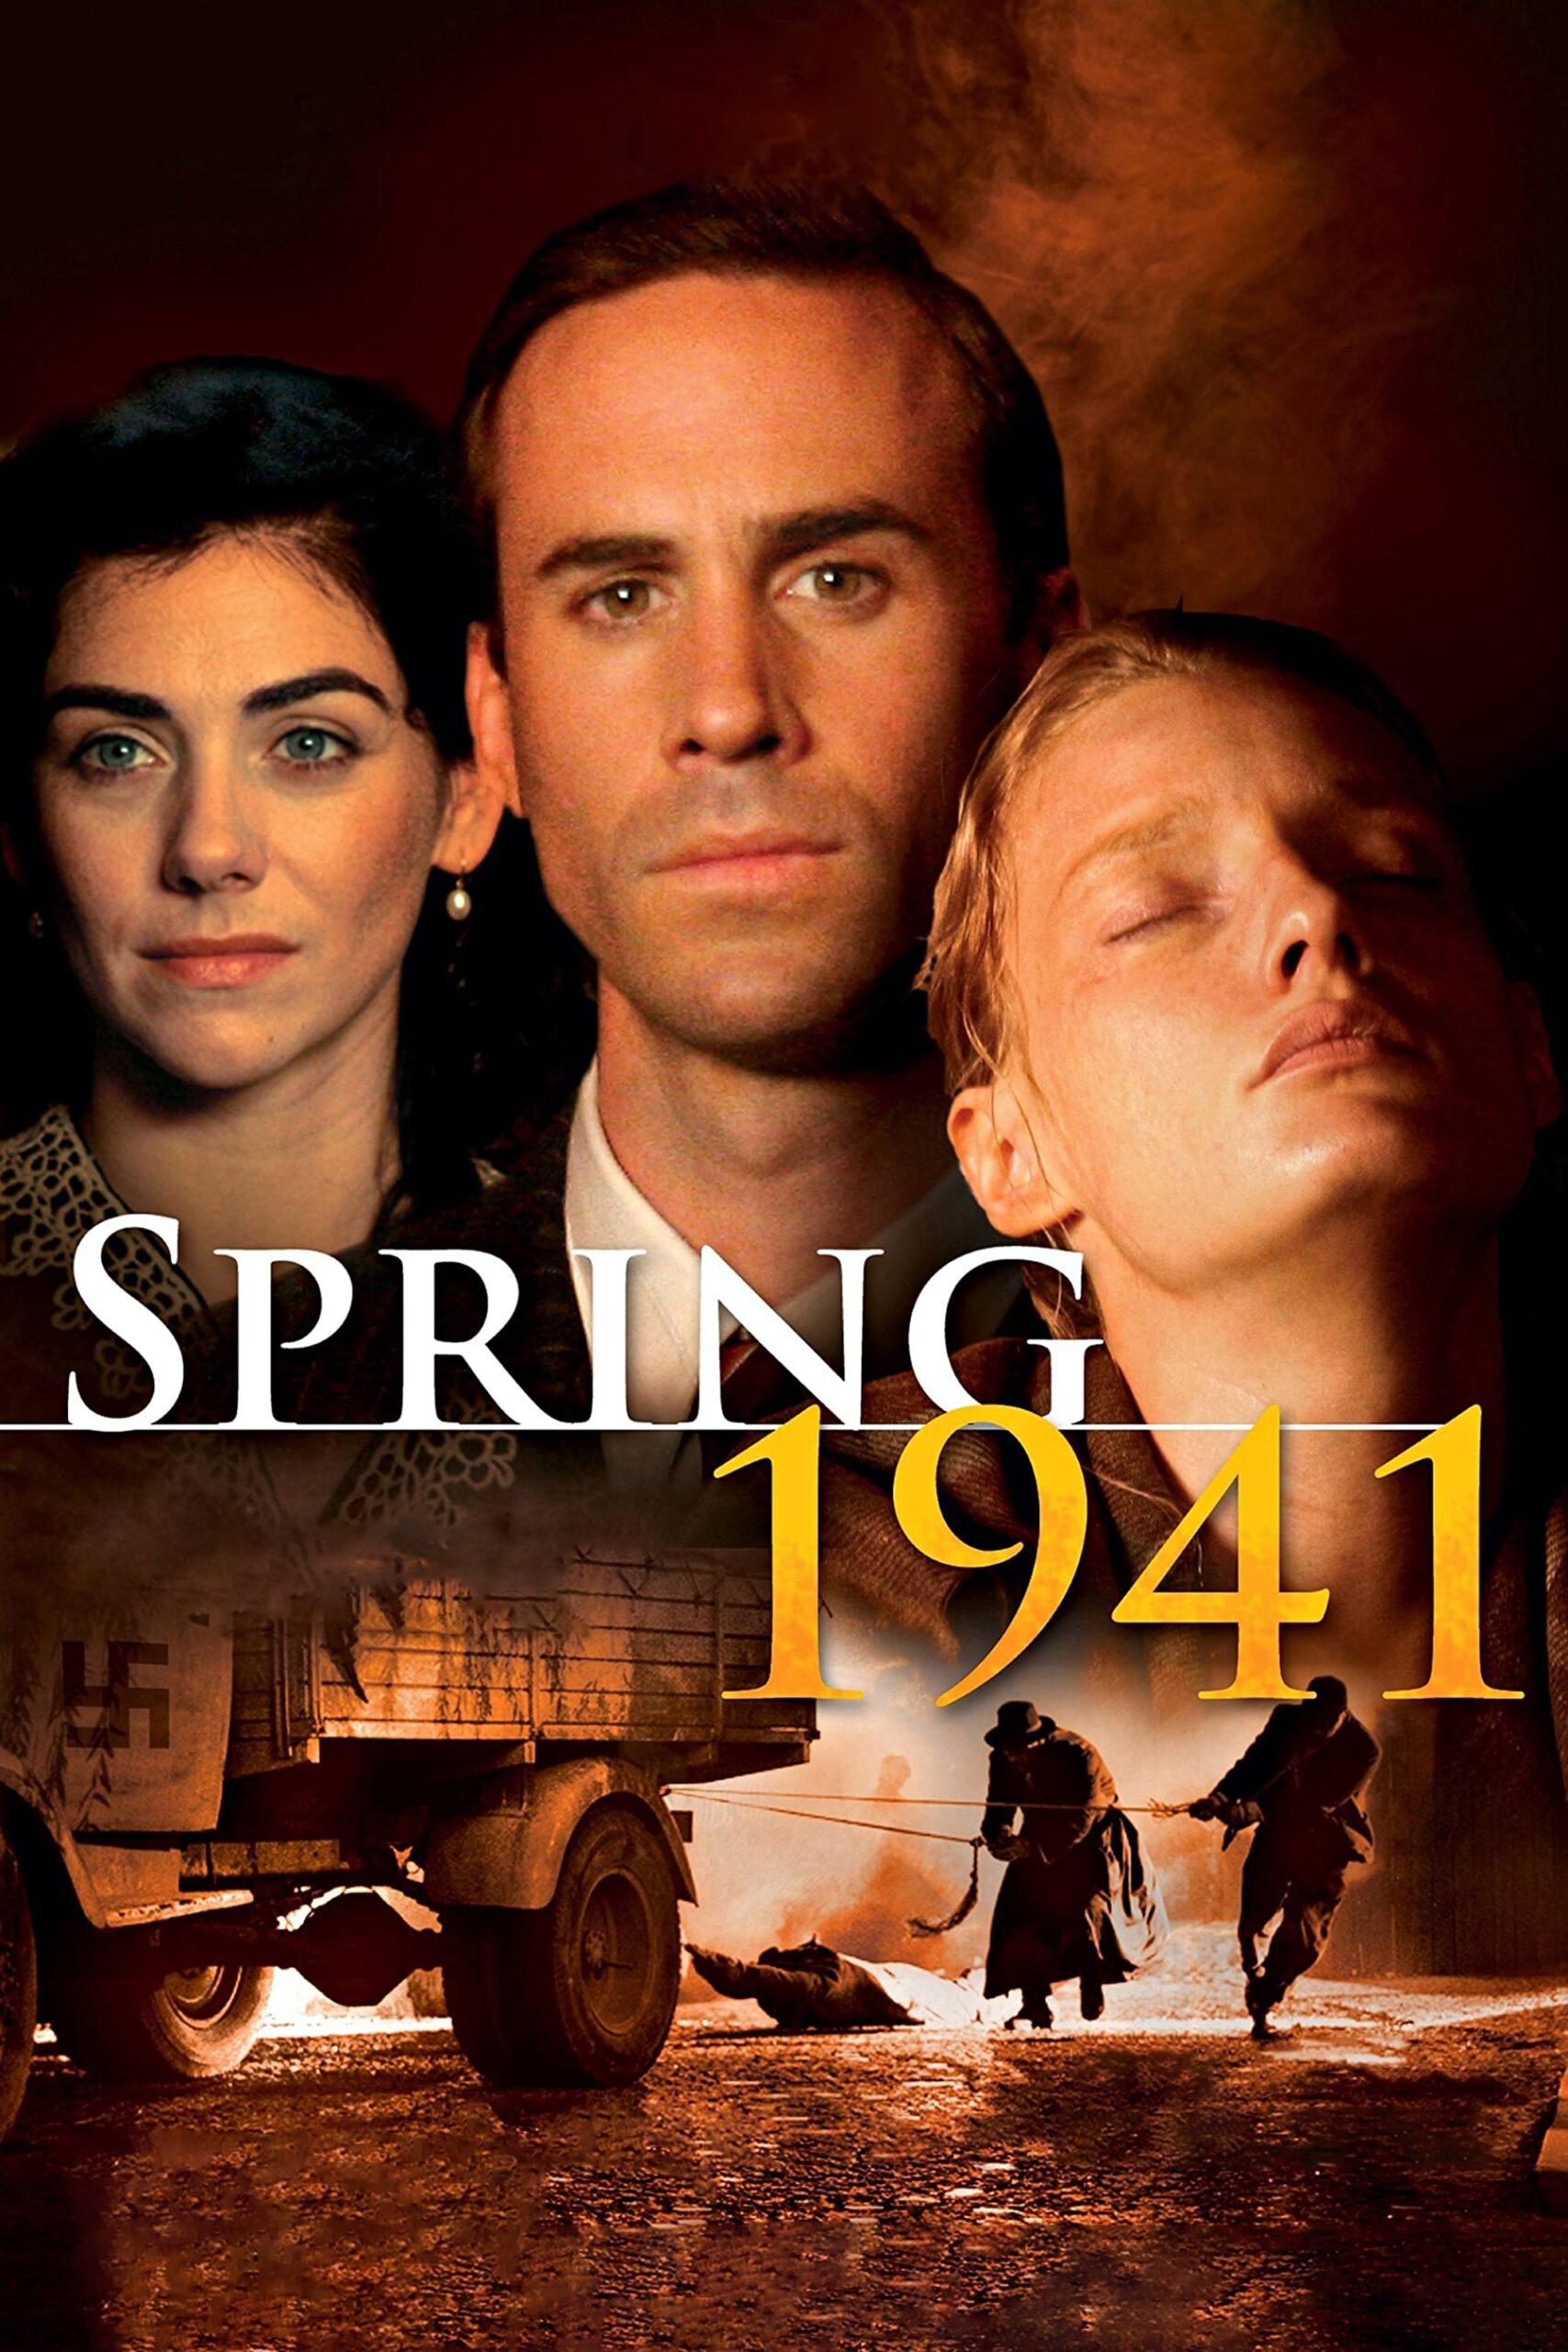 Spring 1941 Movie Streaming Online